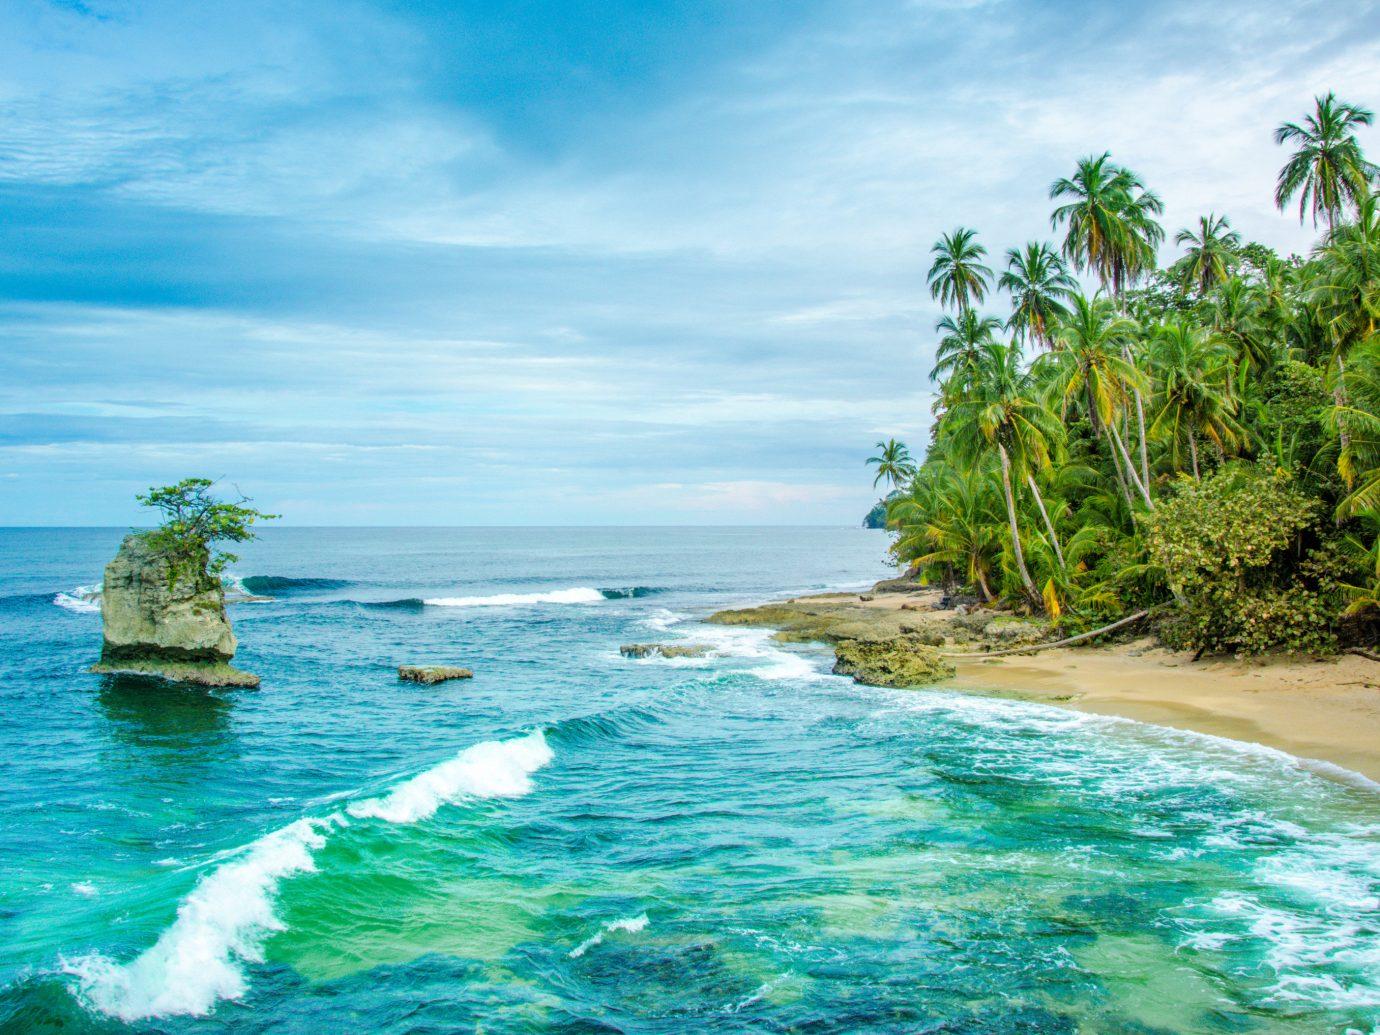 Playa Manzanillo in Costa Rica